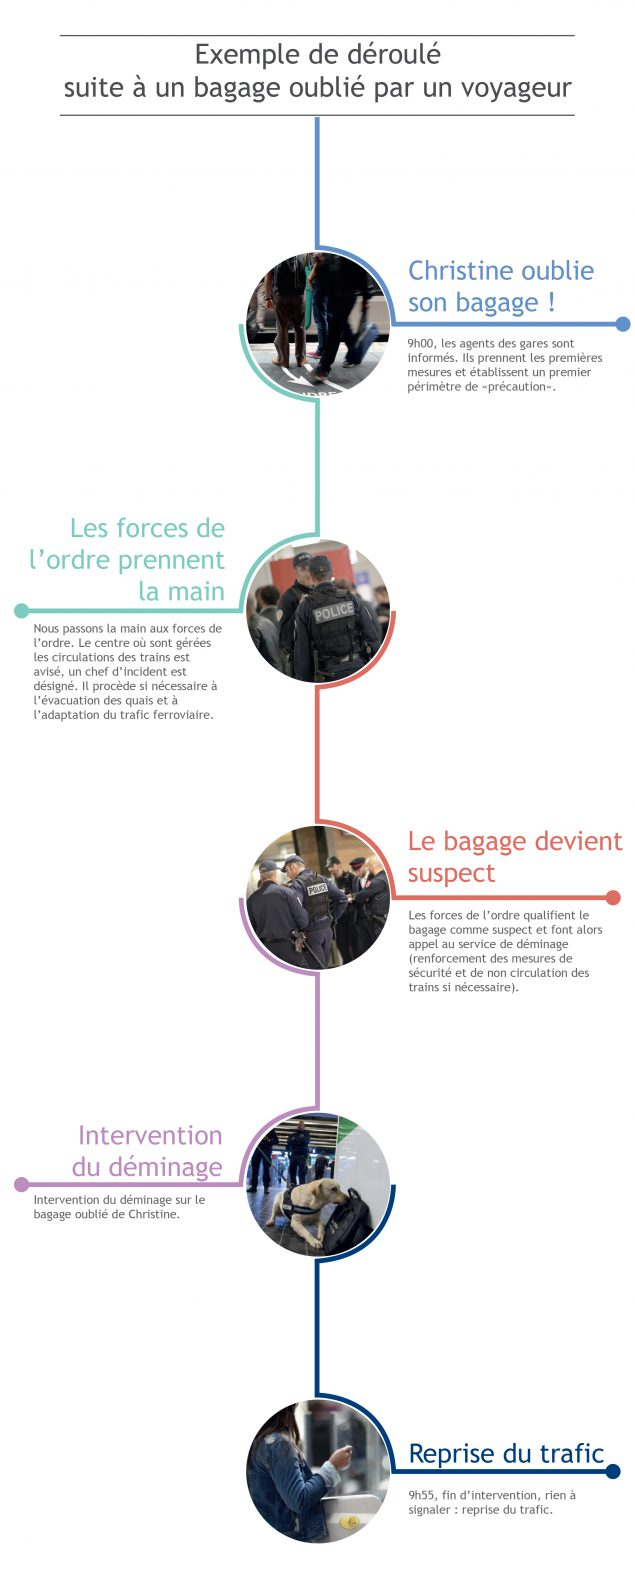 © SNCF/DLU